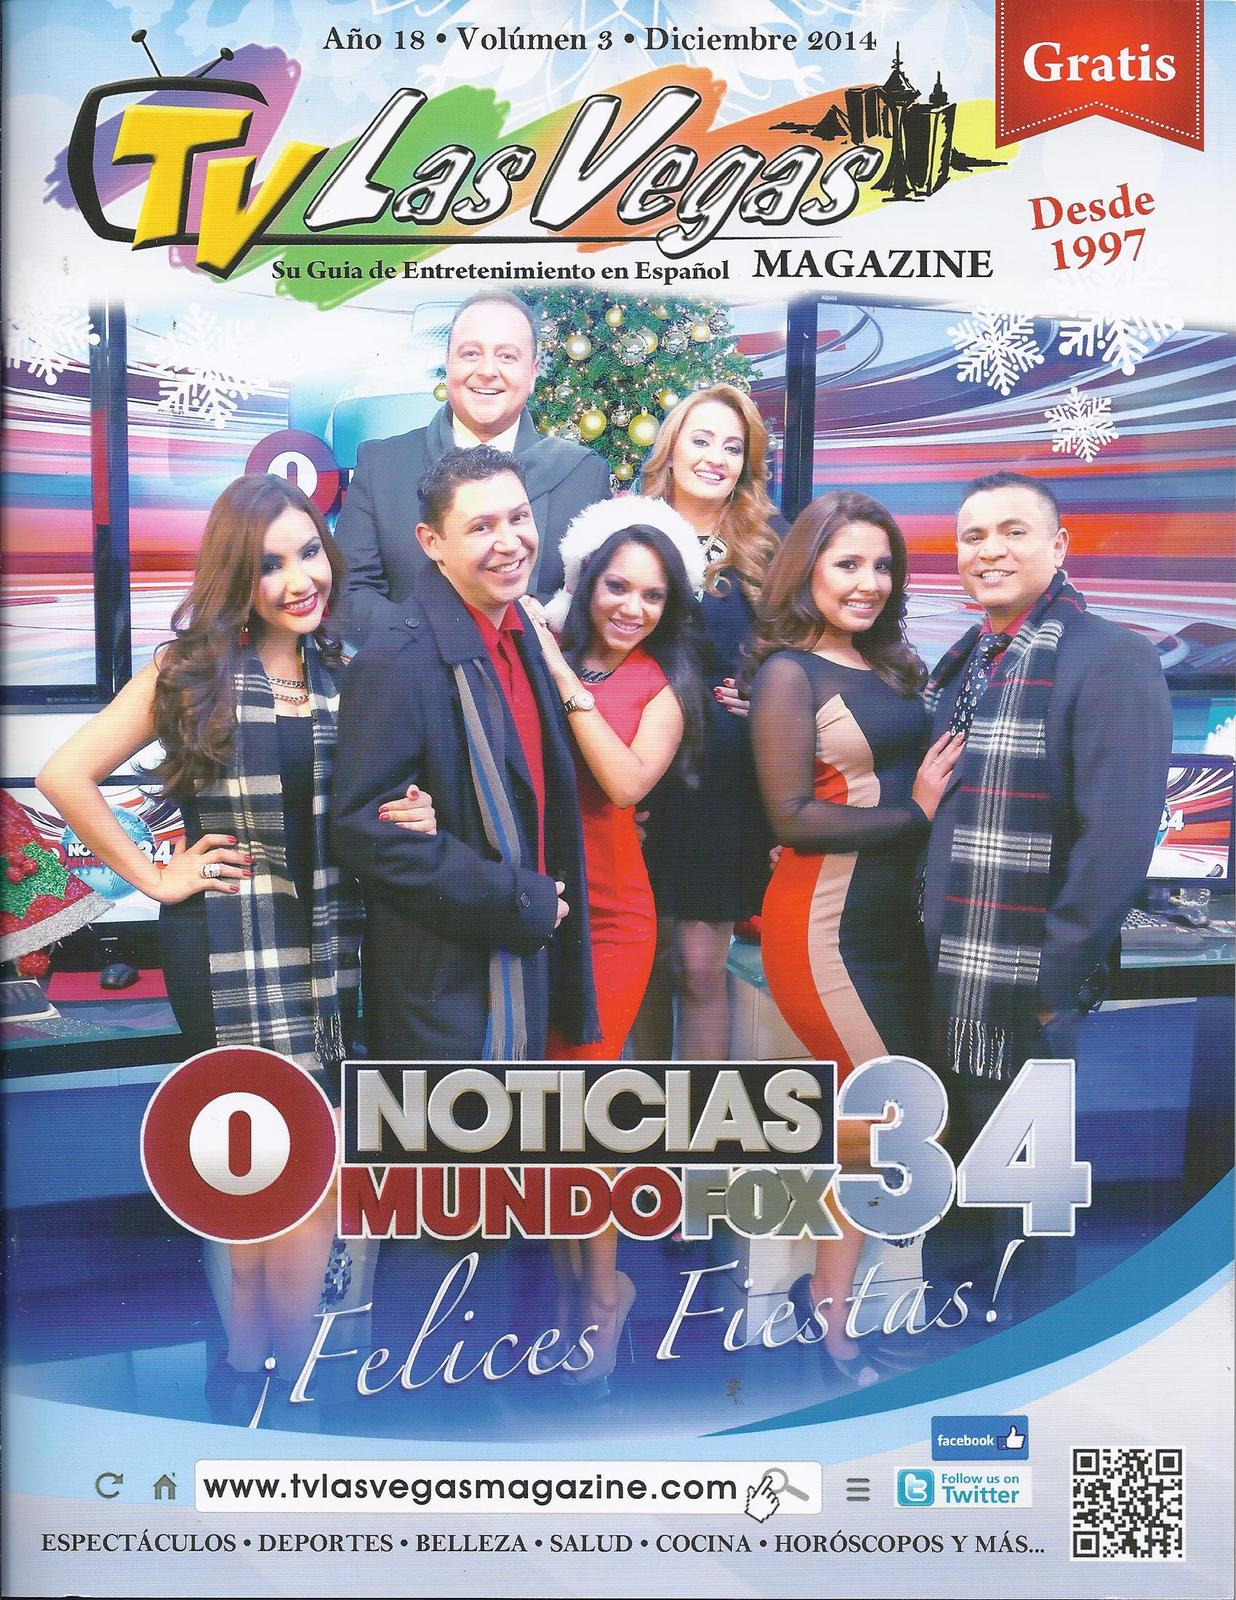 the world news fox 34 cast tv las vegas magazine en. Black Bedroom Furniture Sets. Home Design Ideas